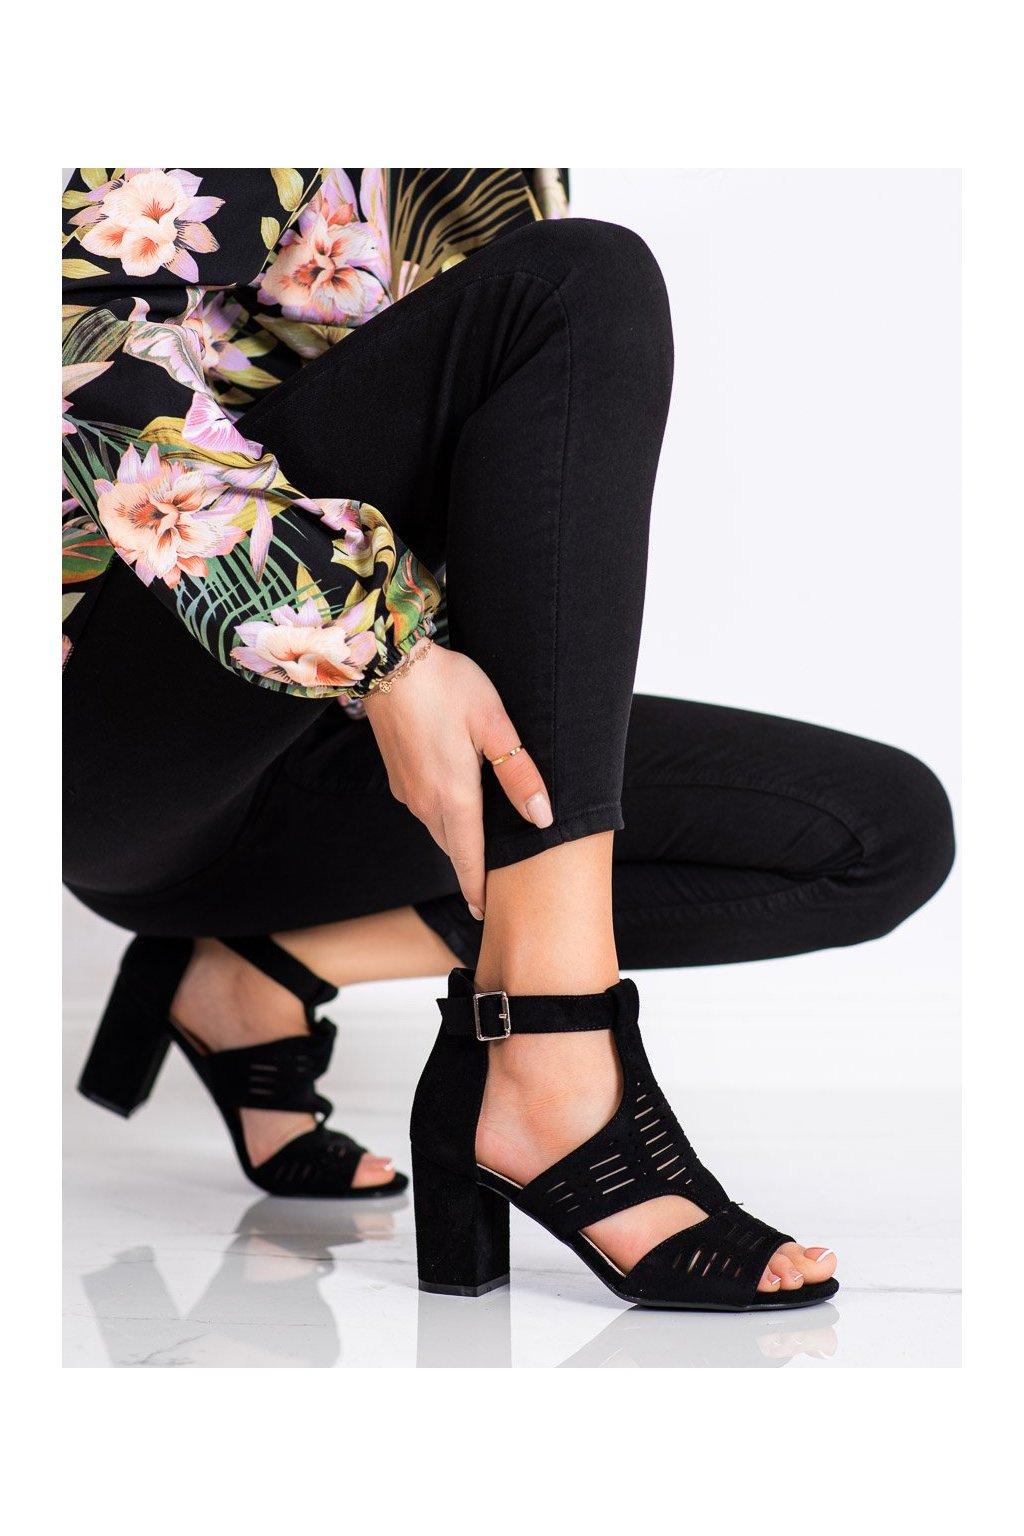 Čierne sandále Sergio leone kod SK903B